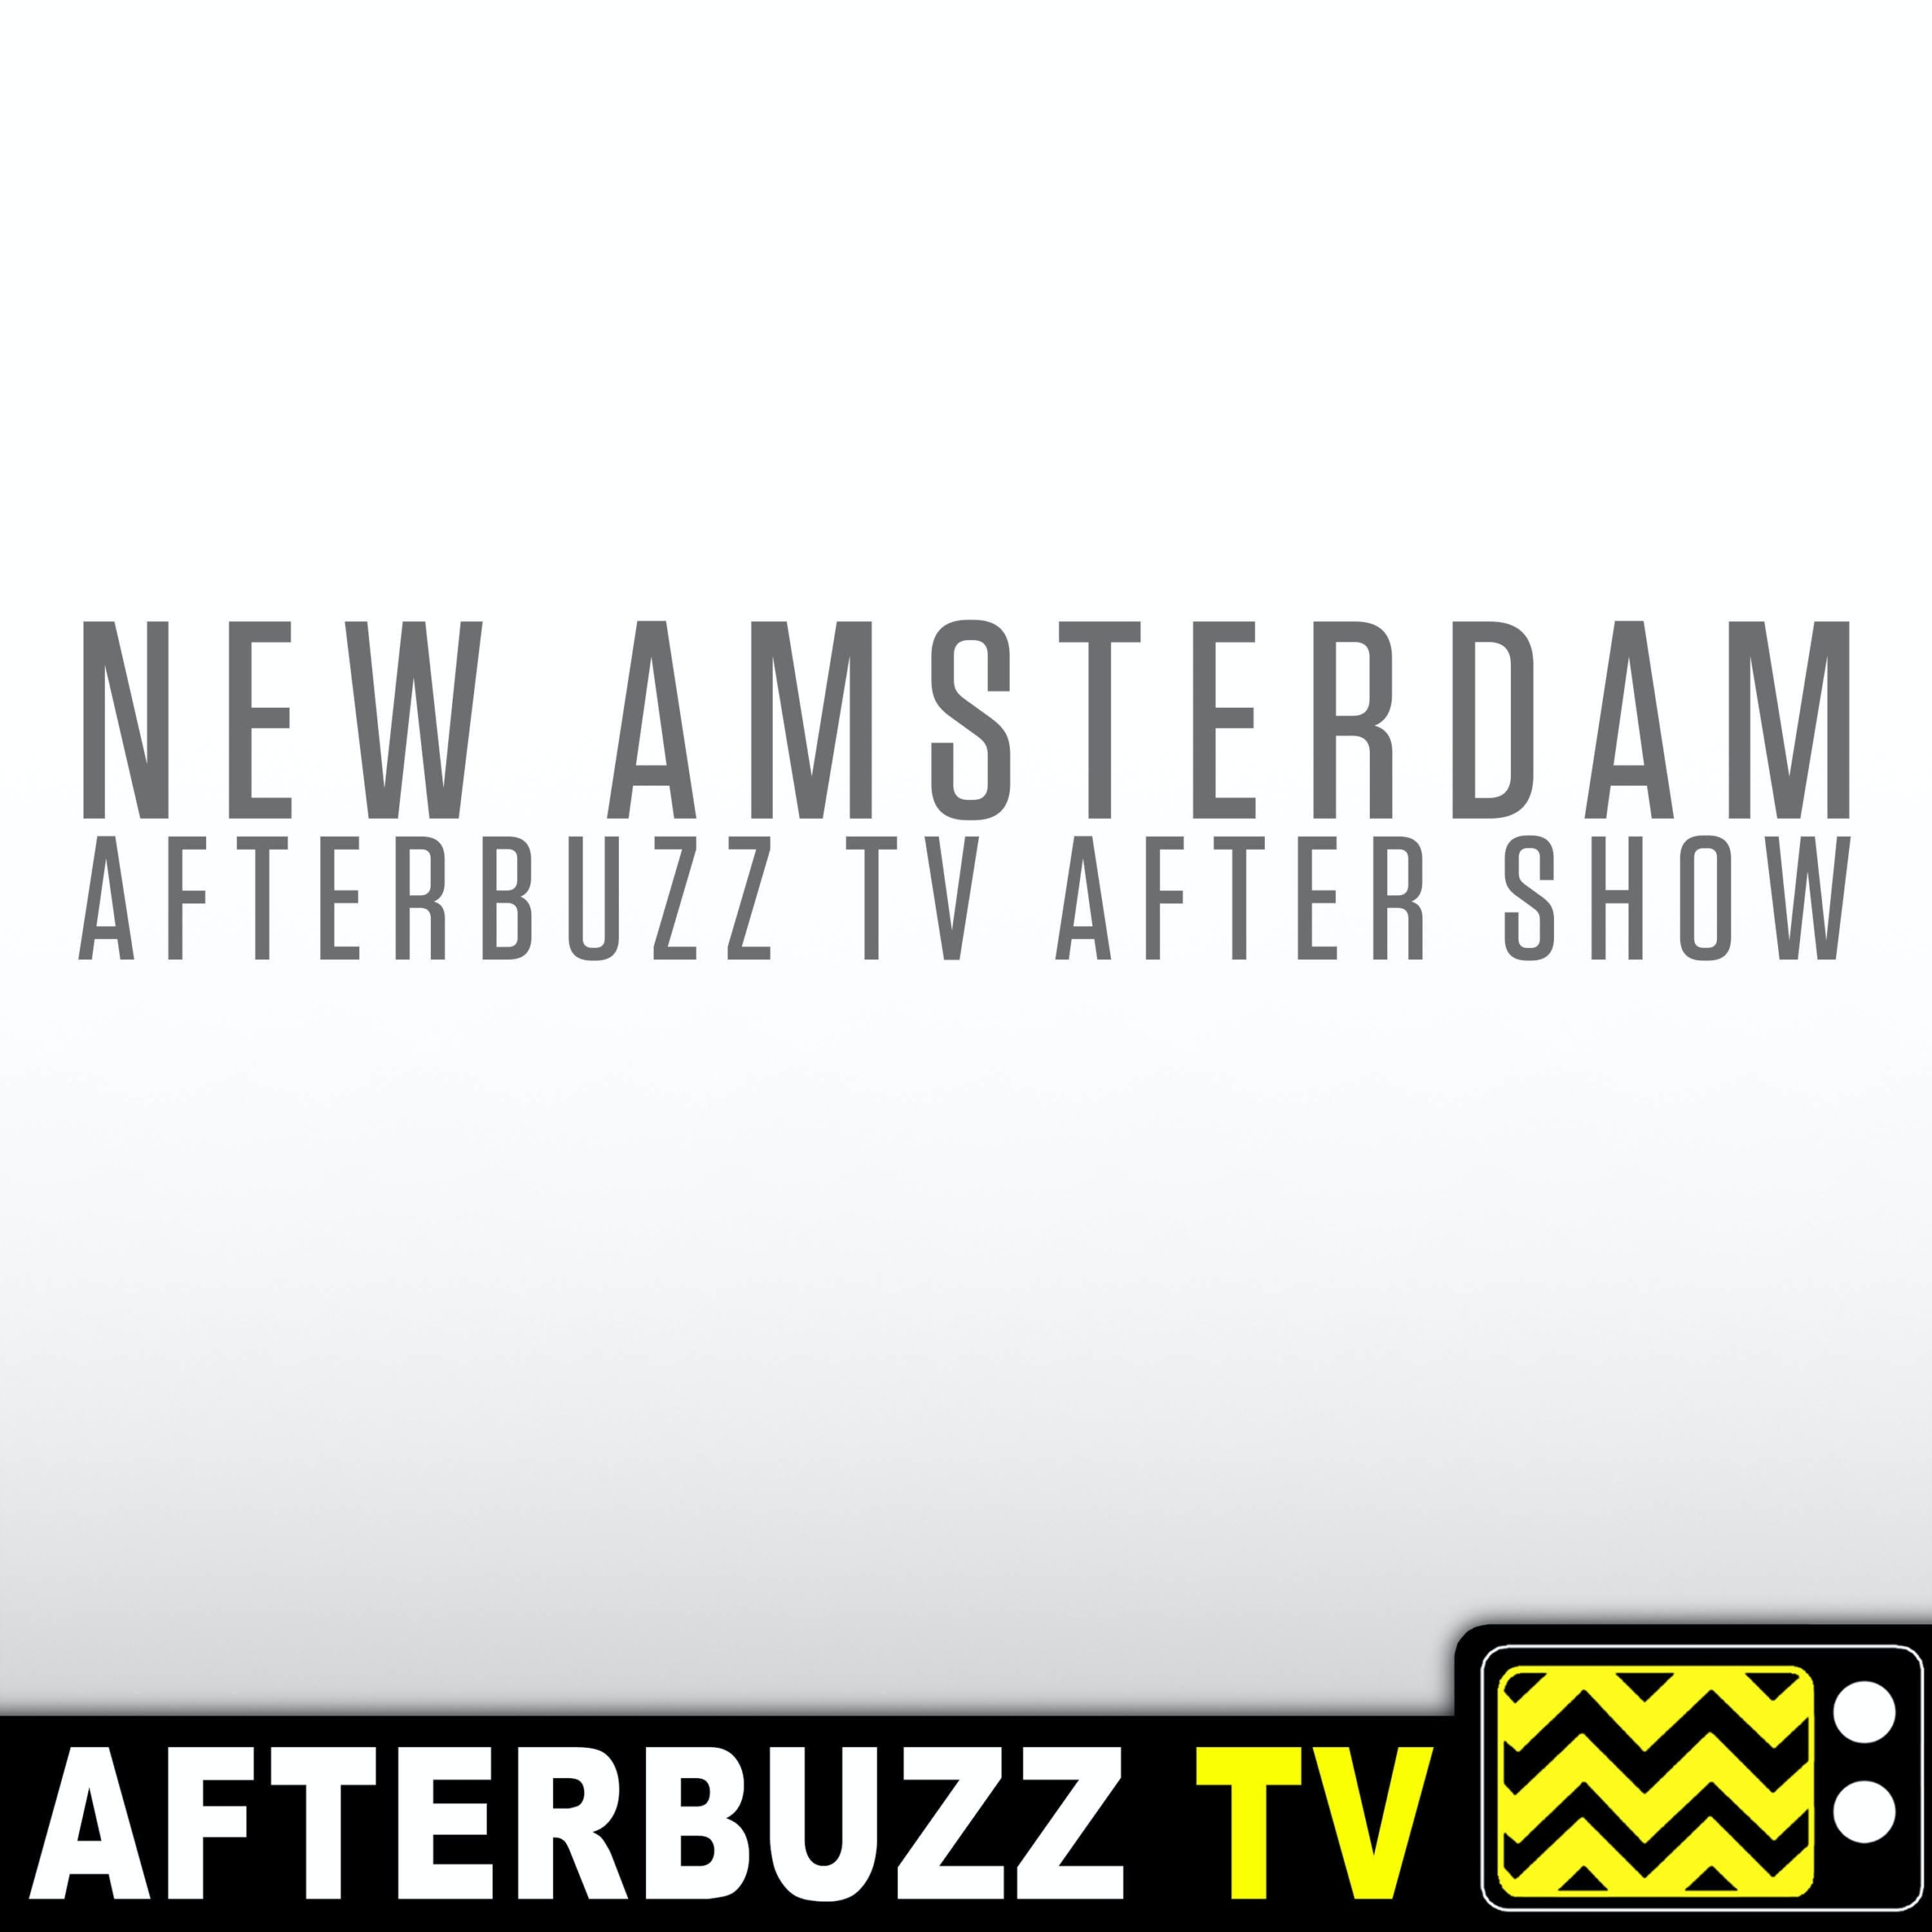 Jocko Sims in Studio to Talk New Amsterdam!